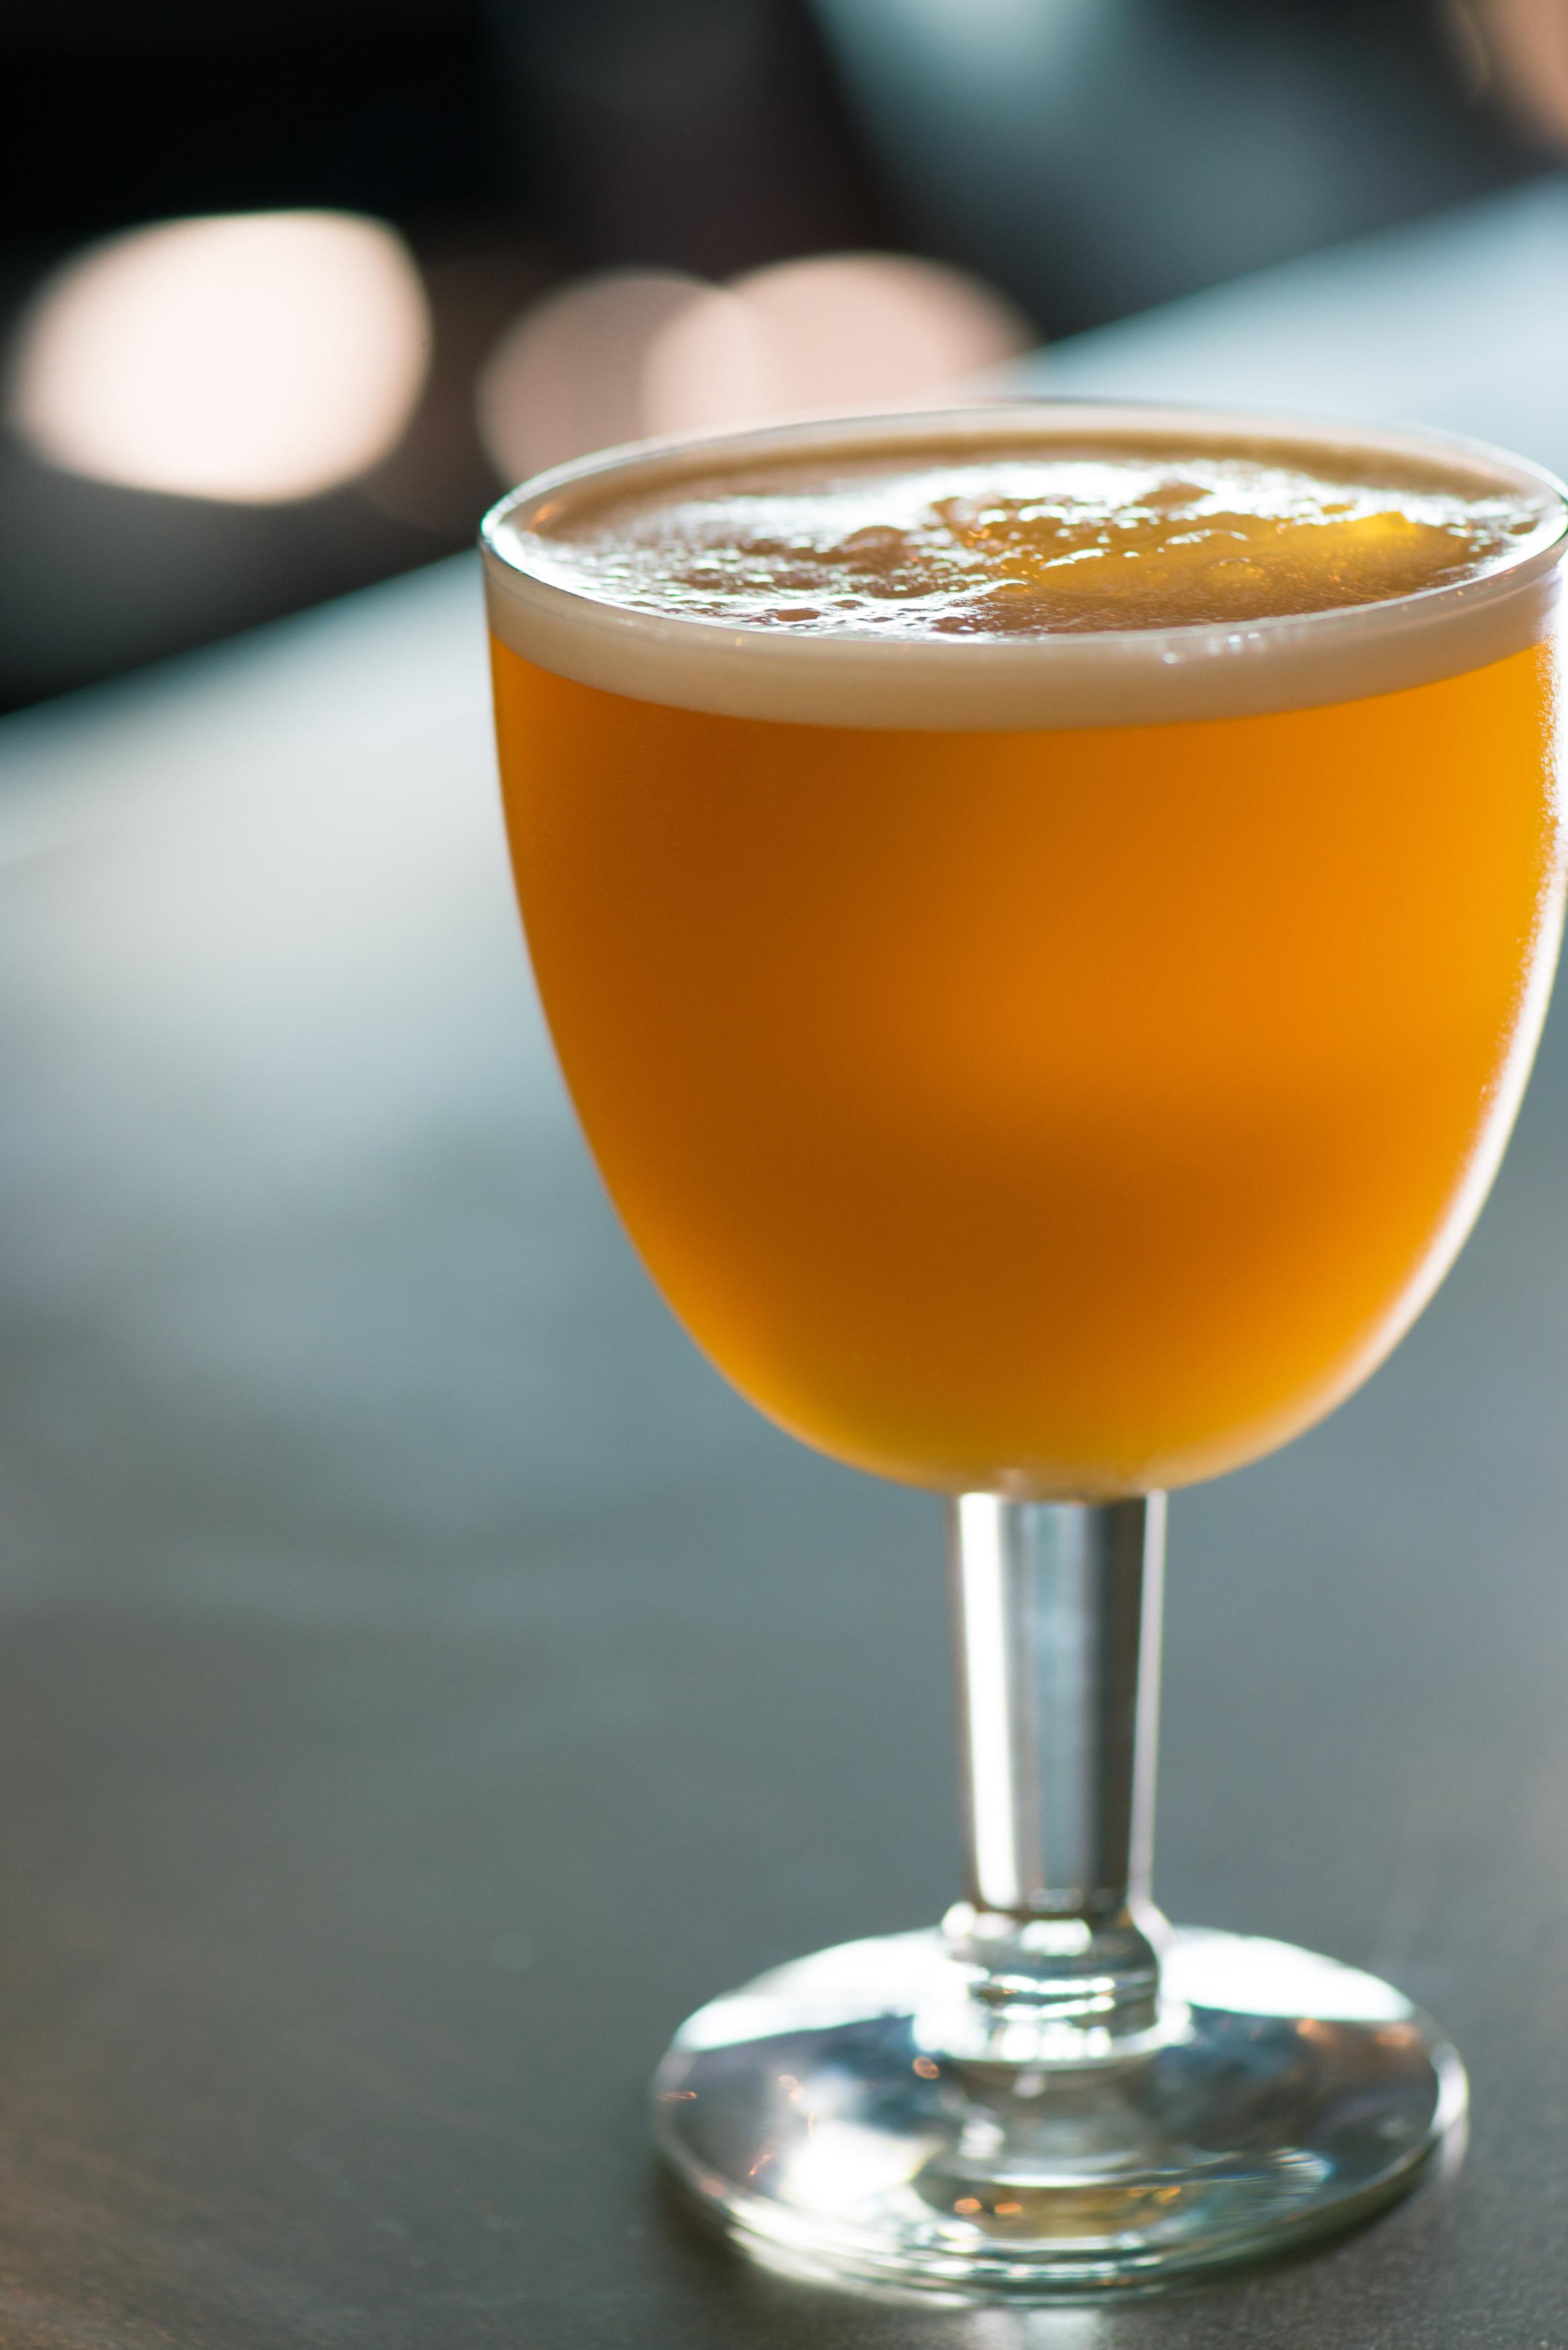 Yardhouse introduces beer cocktails summercocktails for Cocktail ginger beer